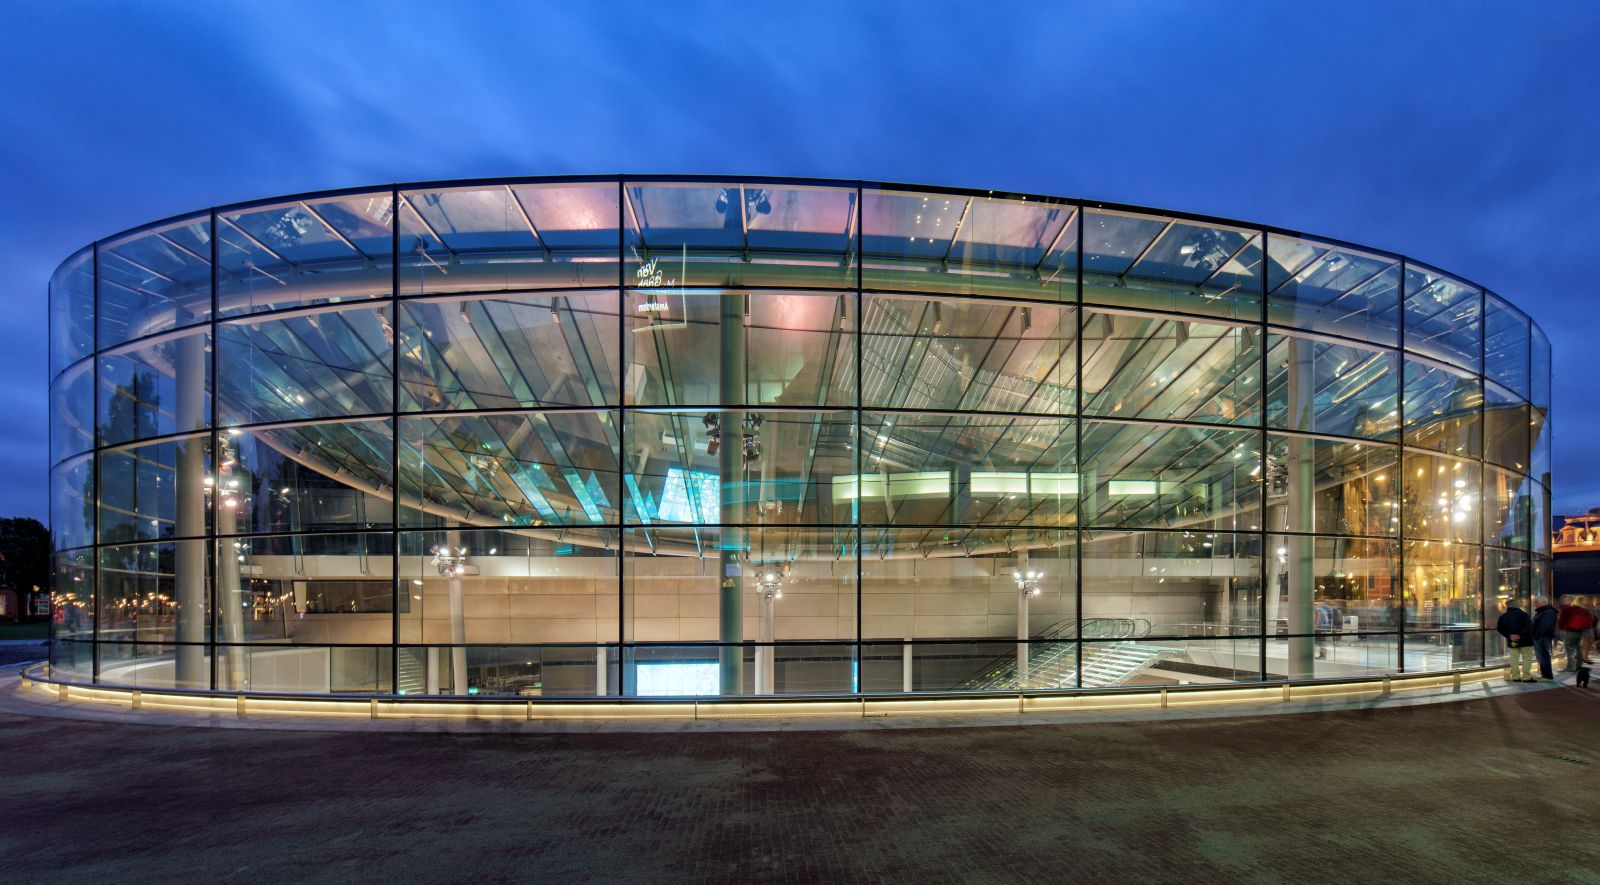 Home Design On A Budget New Entrance Hall Van Gogh Museum By Hans Van Heeswijk